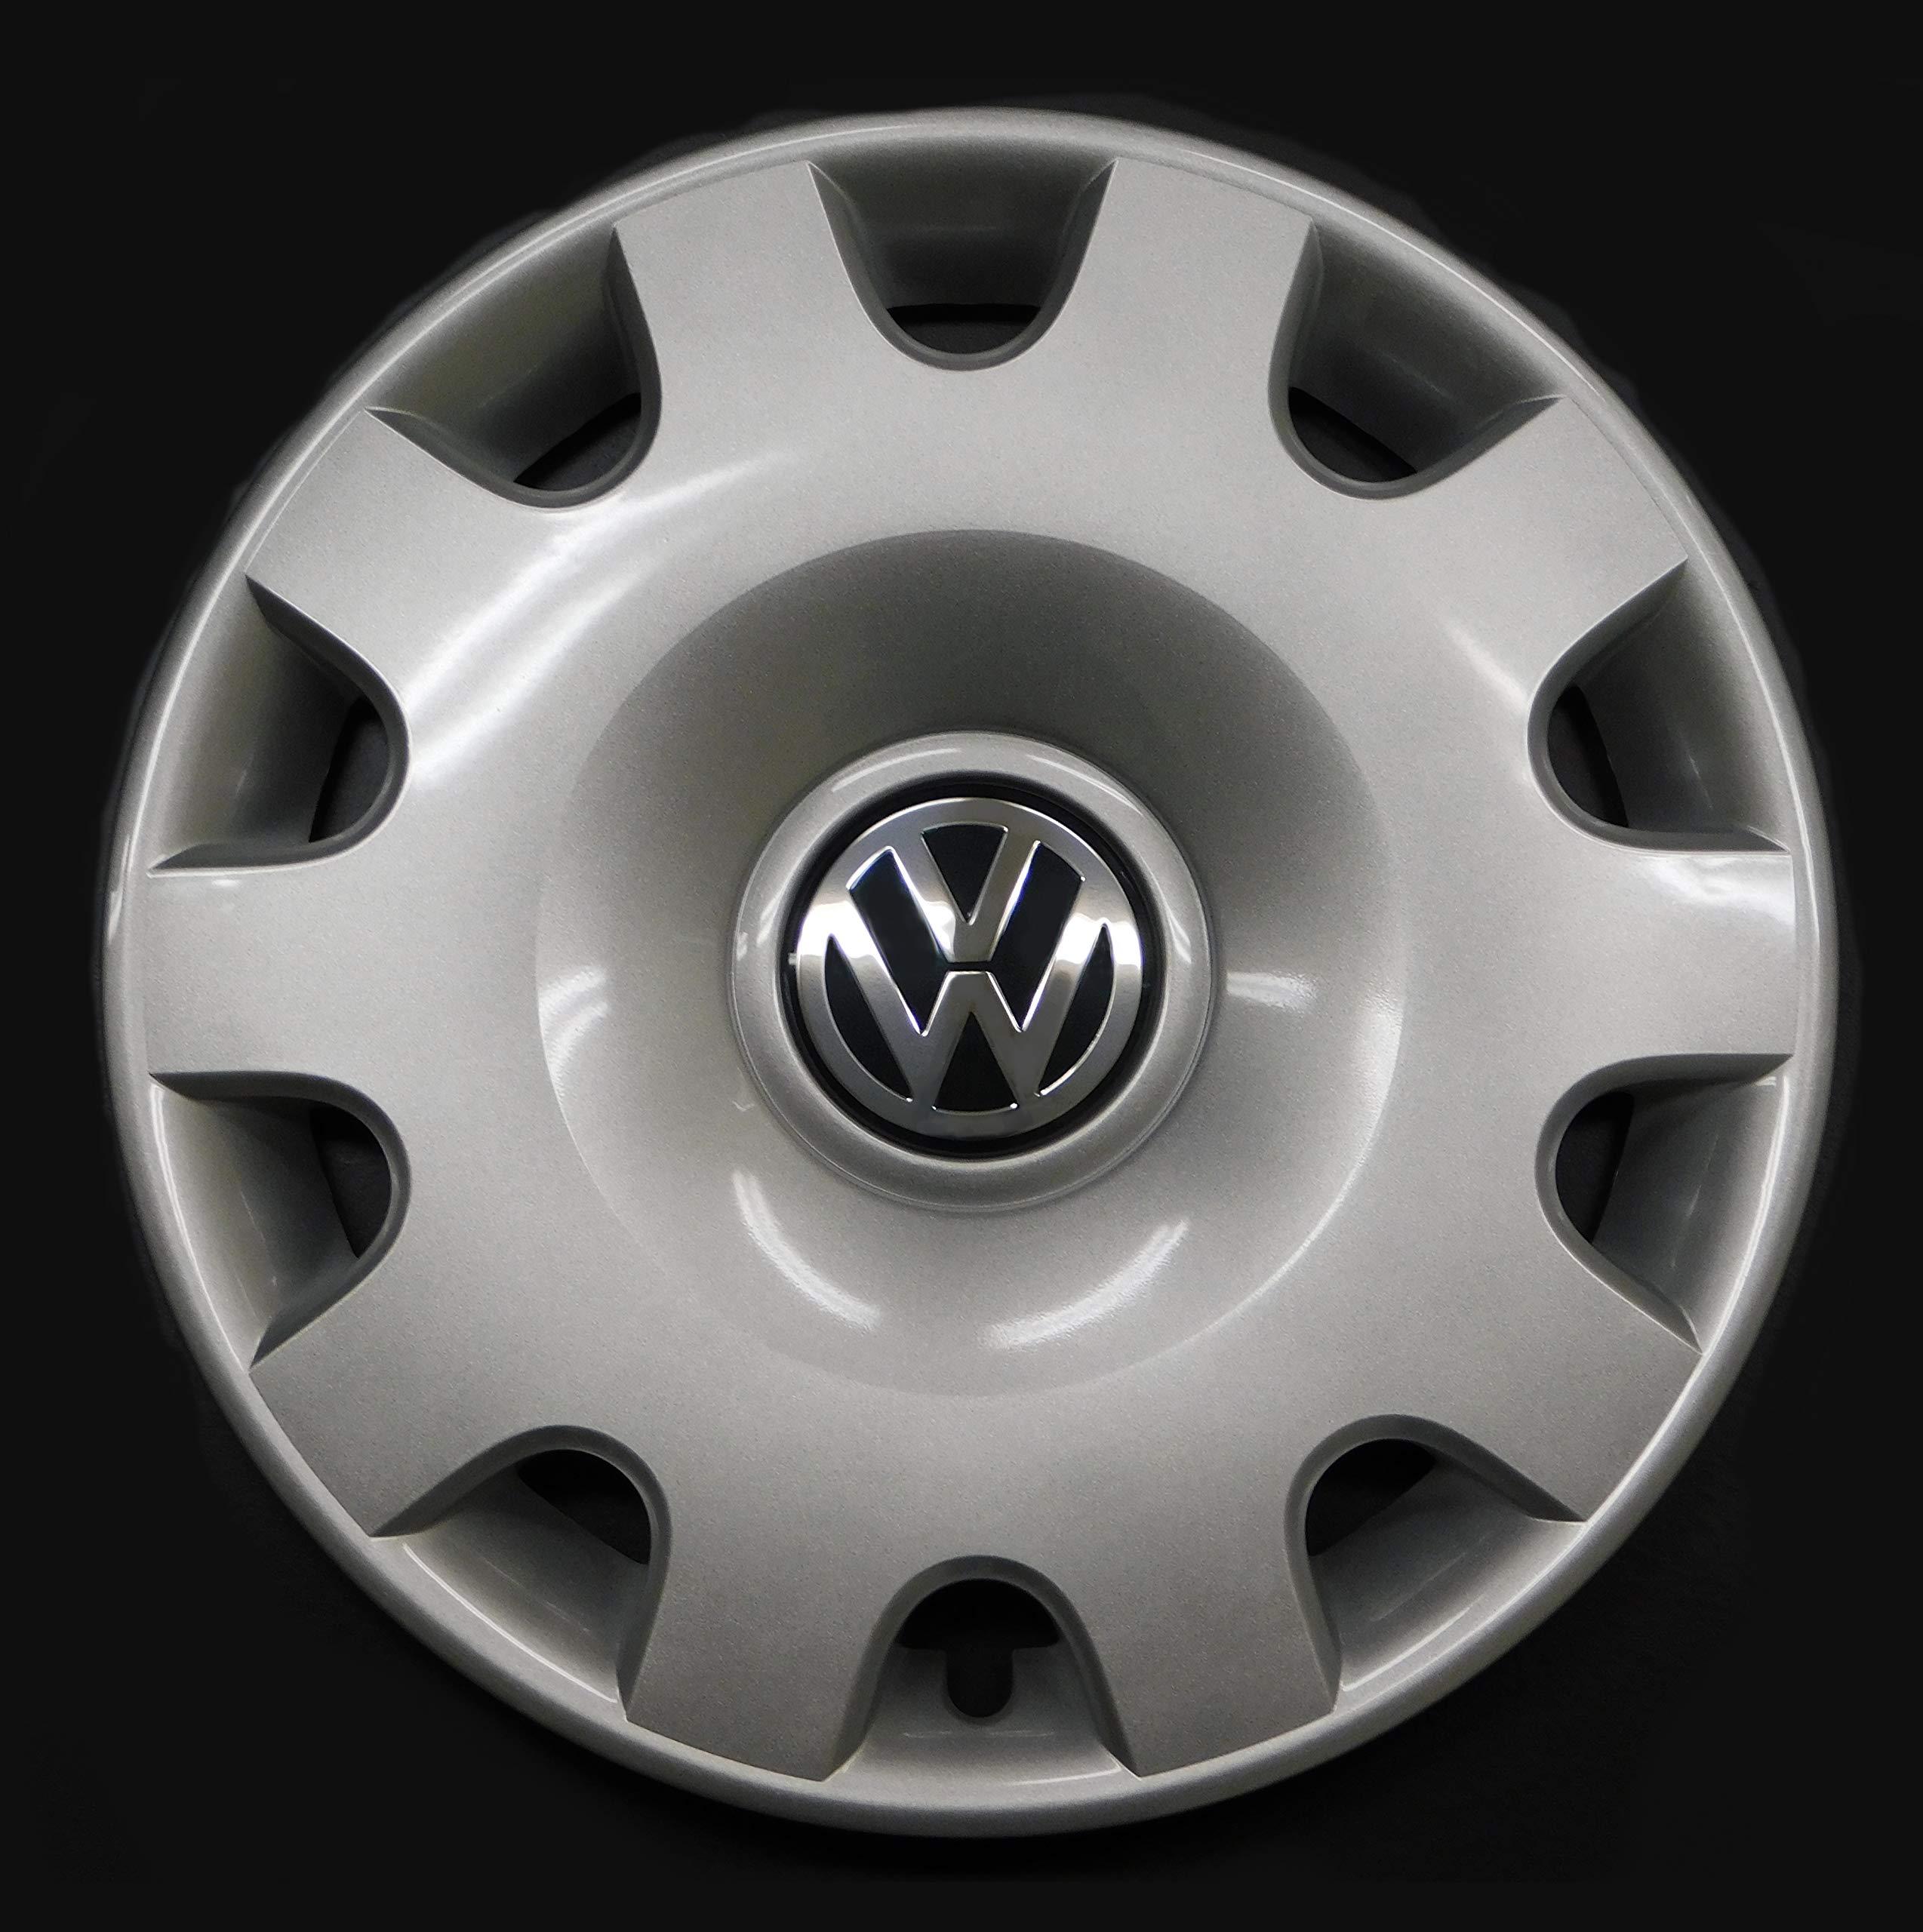 Amazon.com: Volkswagen 1J0601147NGJW Hubcap Jetta 1999-2005 Cover fits 15 Inch Wheel: Automotive